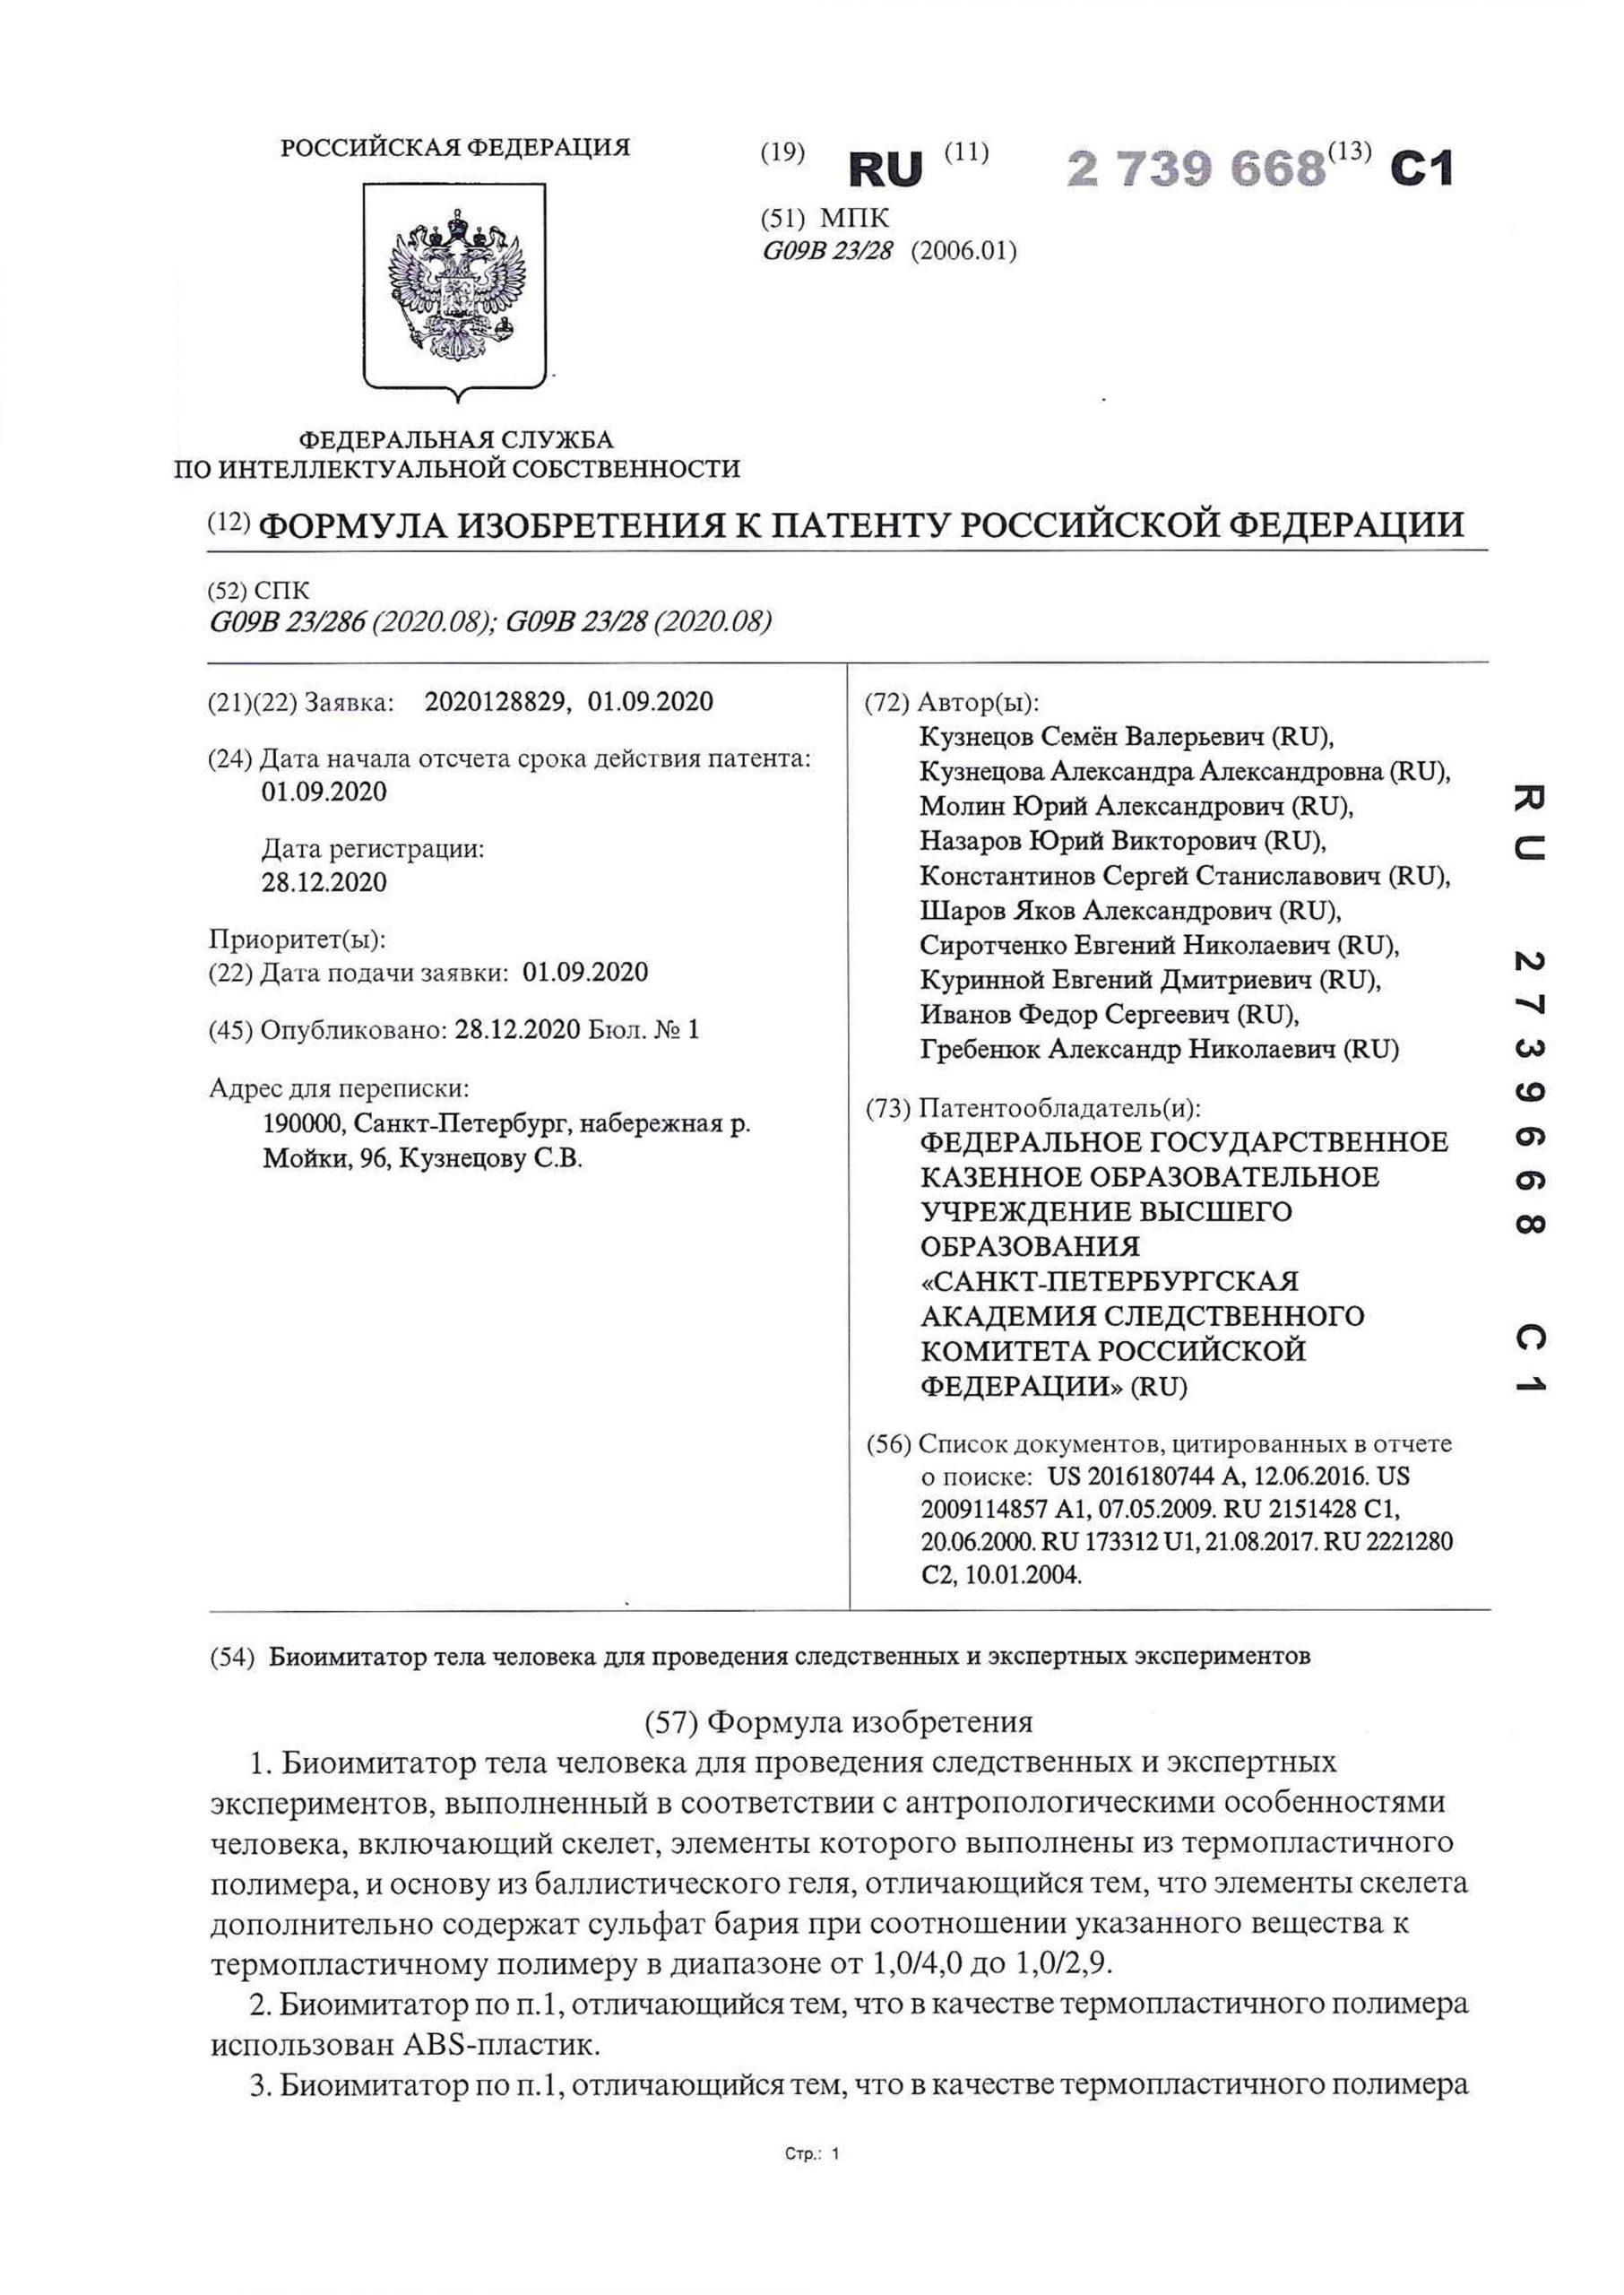 Биоимитатор_0003